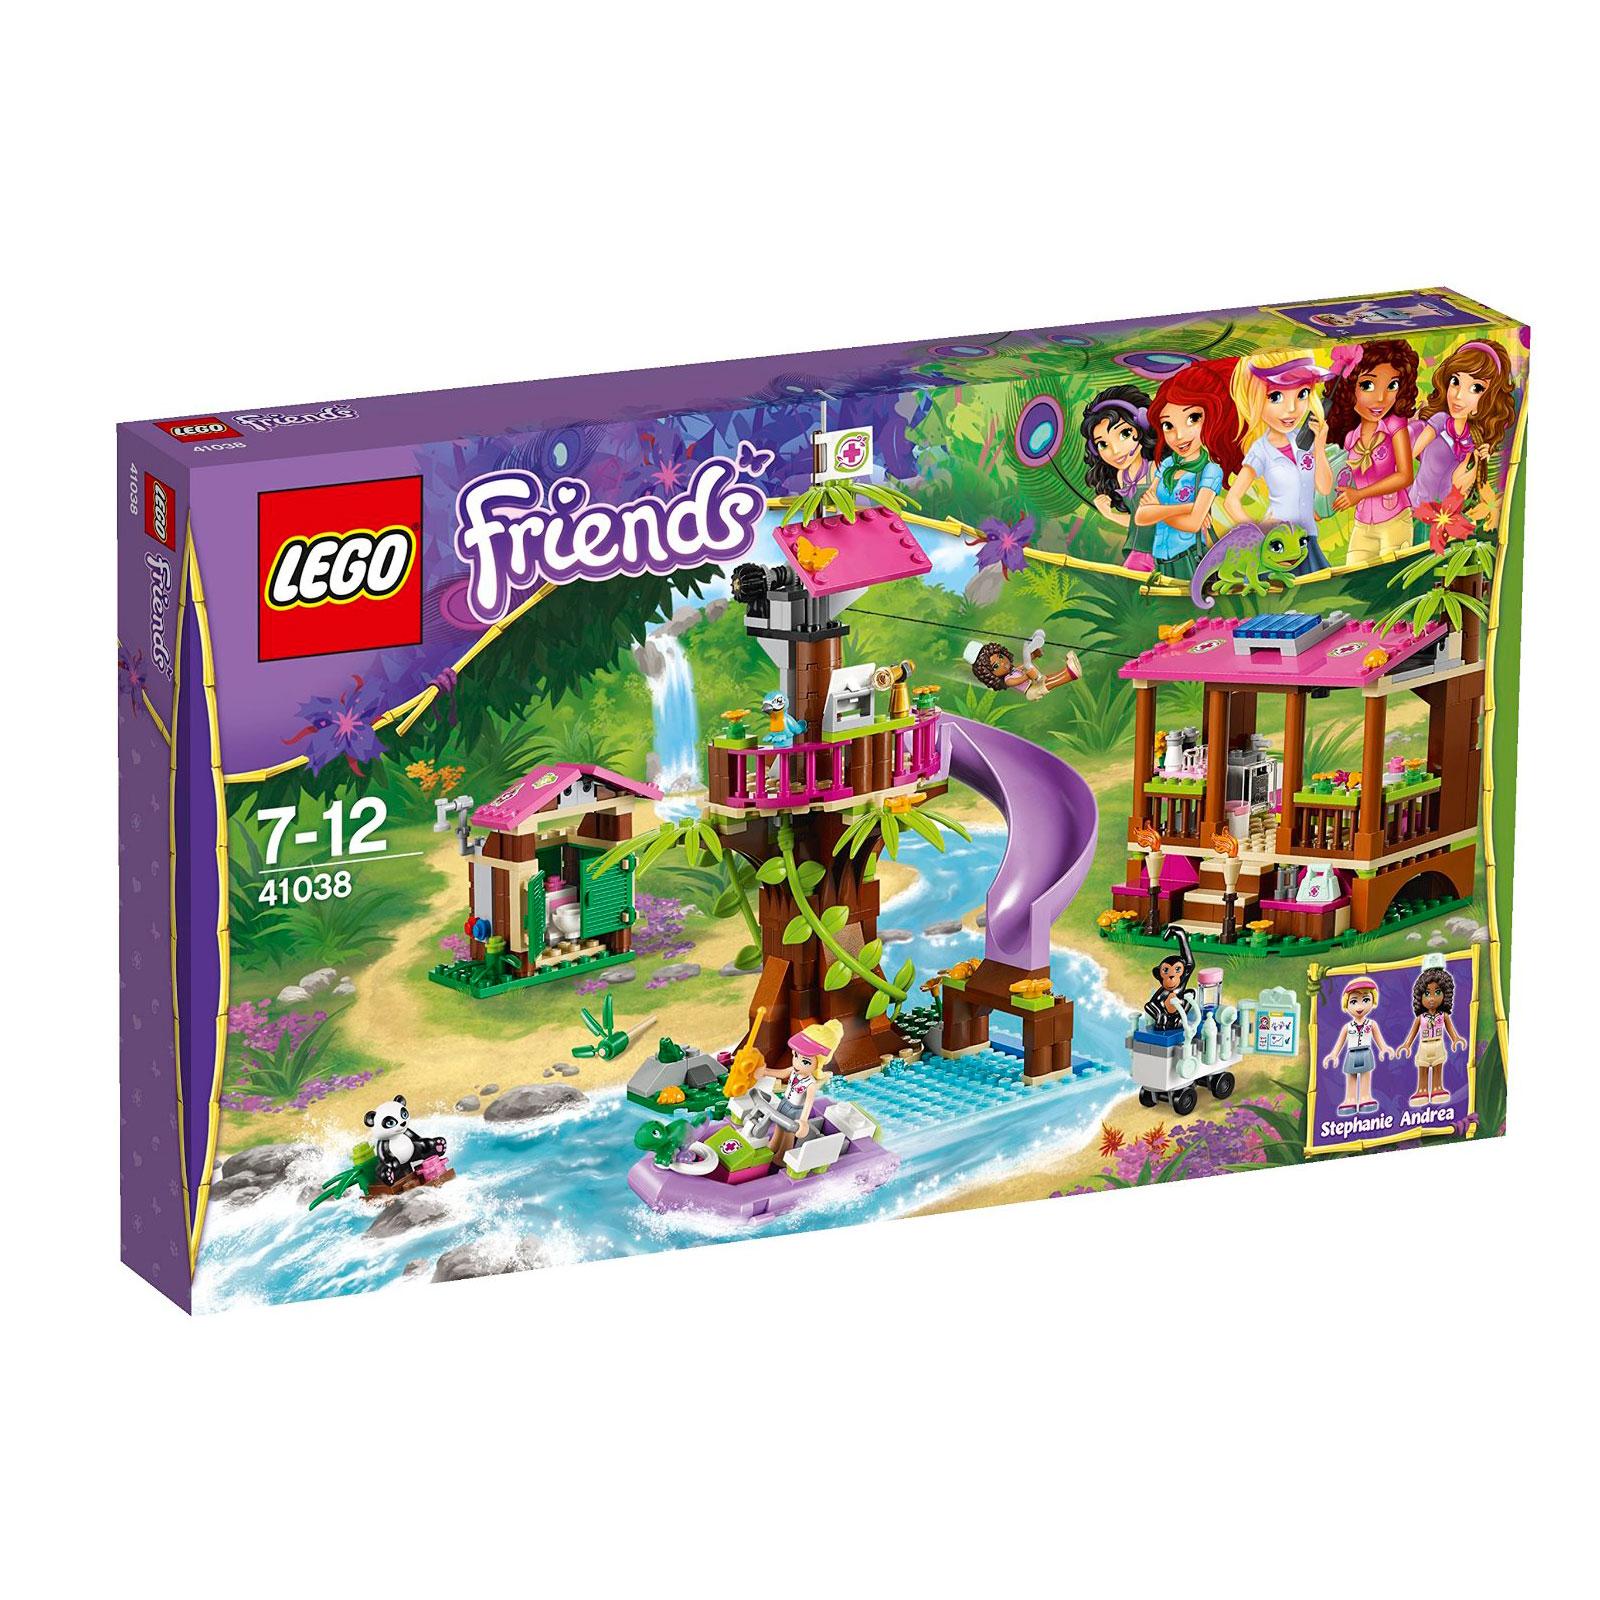 ����������� LEGO Friends 41038 �������: ���� ����������